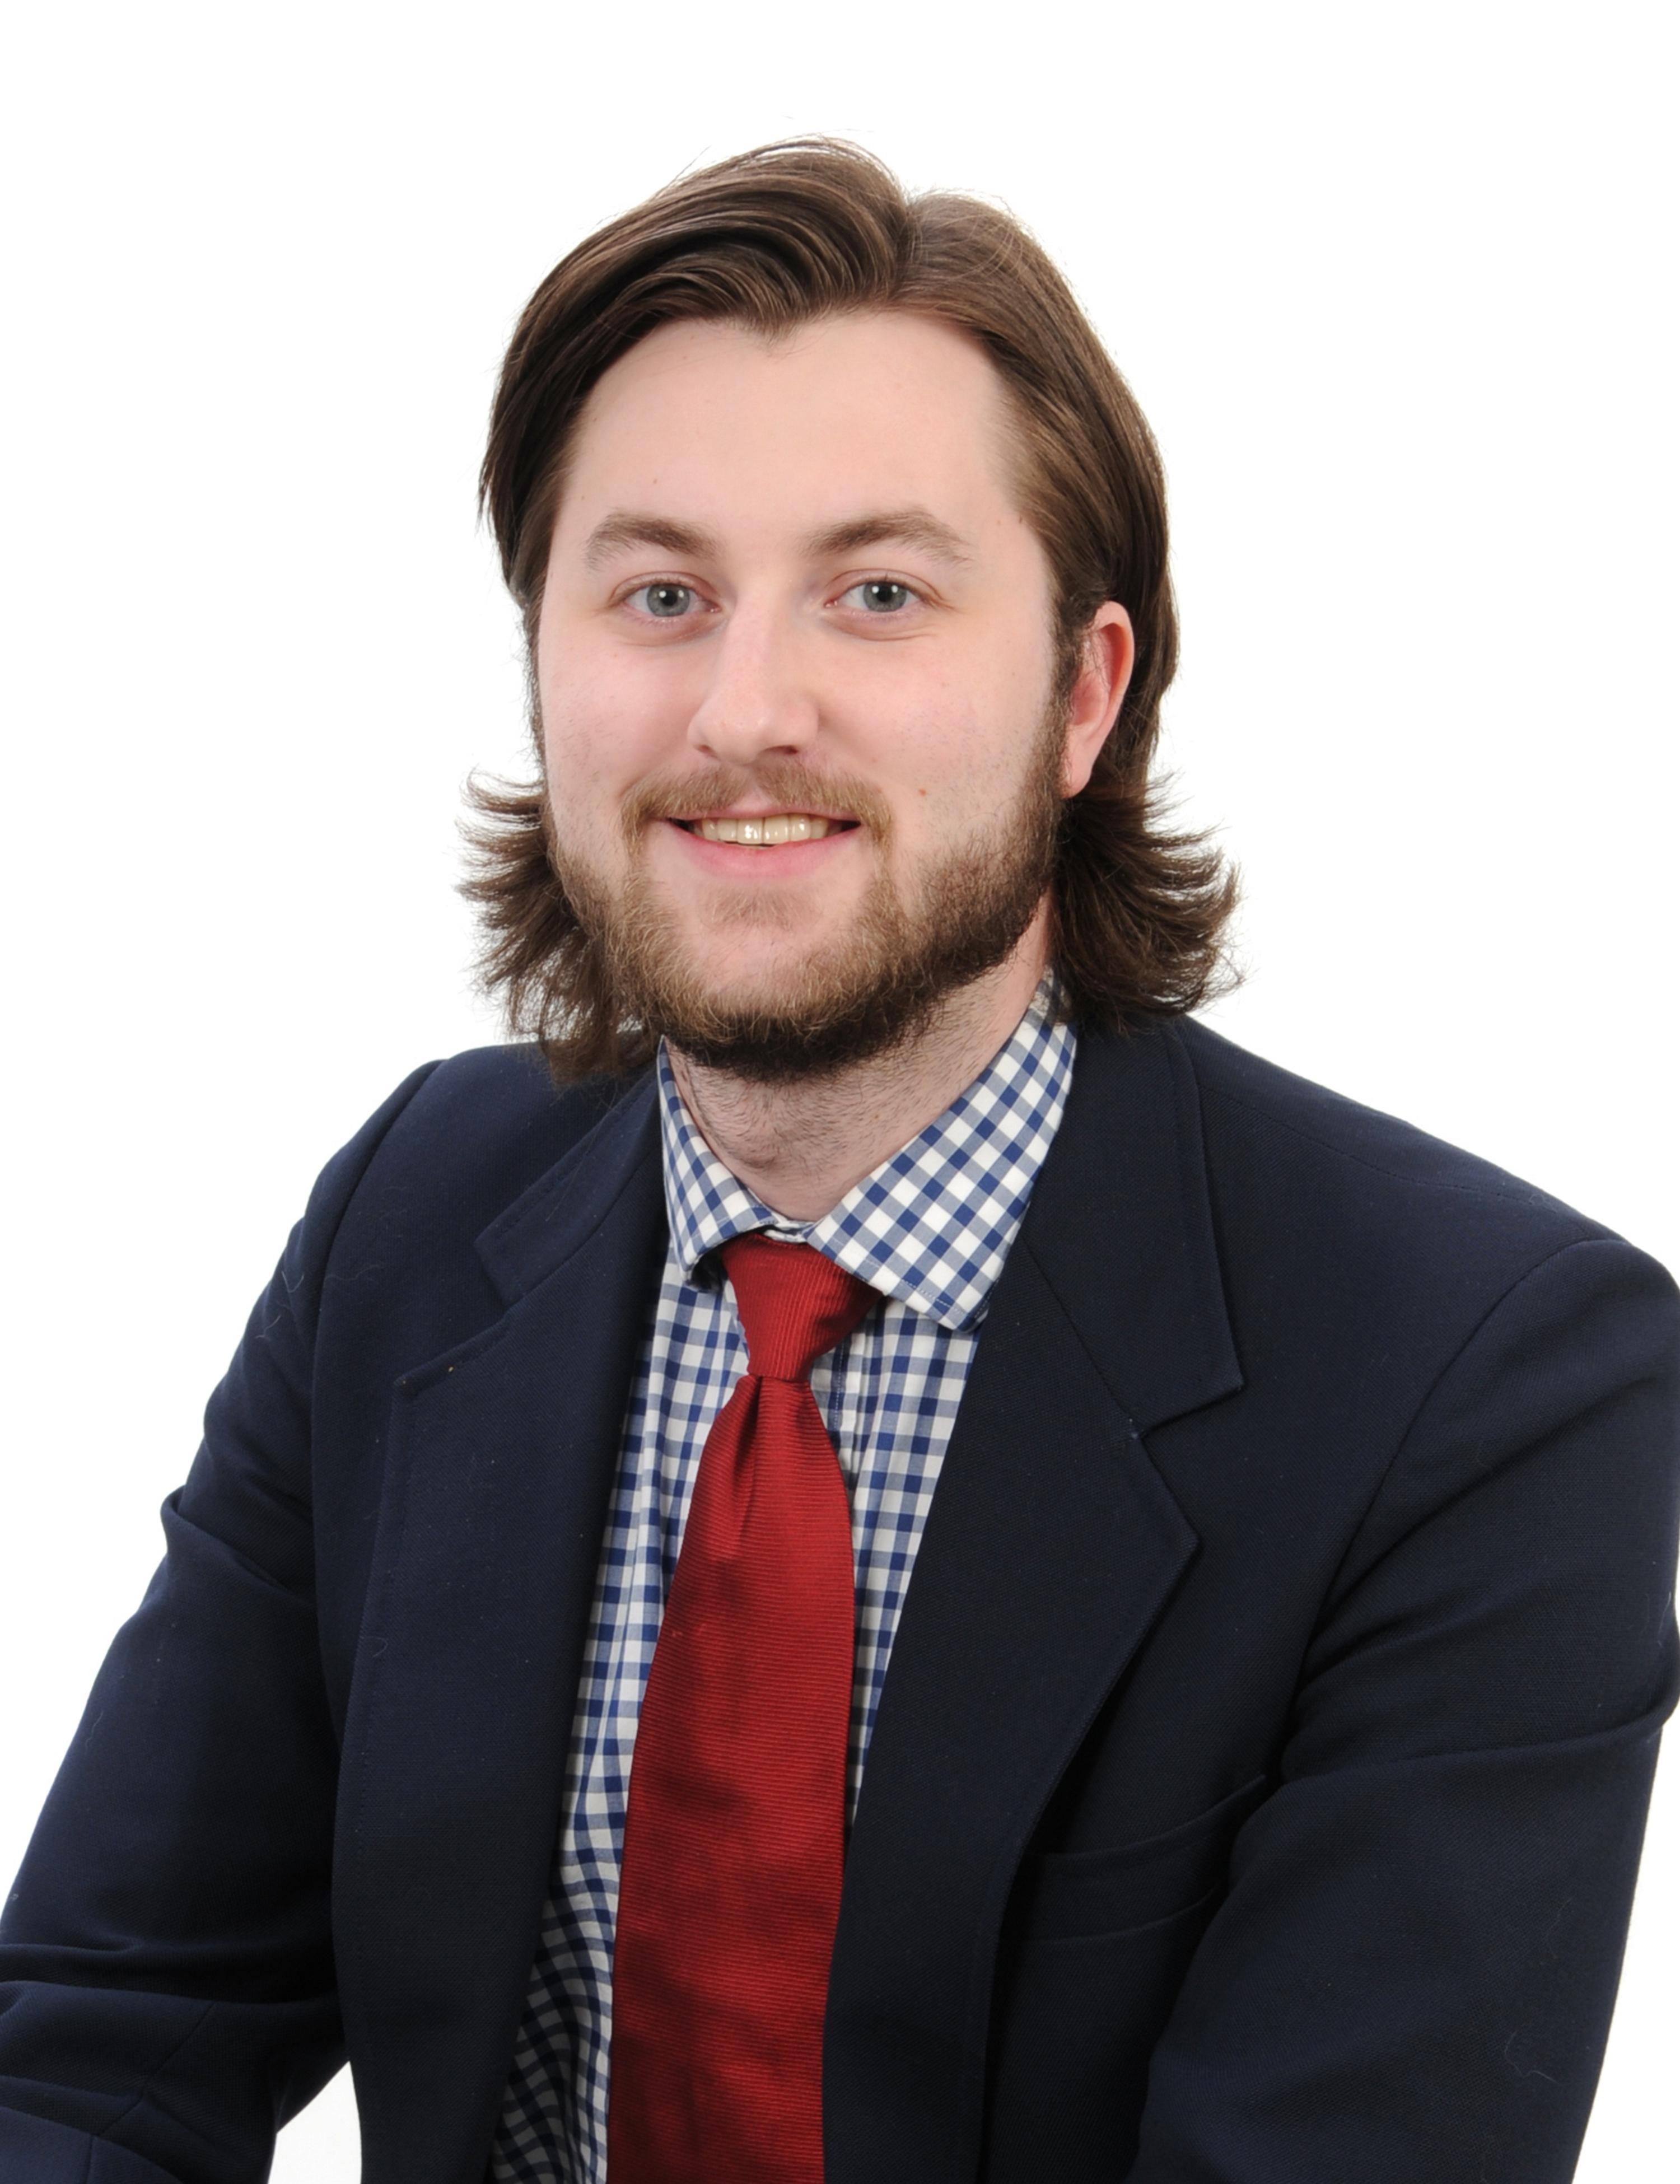 Chris Costlow | IT HelpDesk Technician